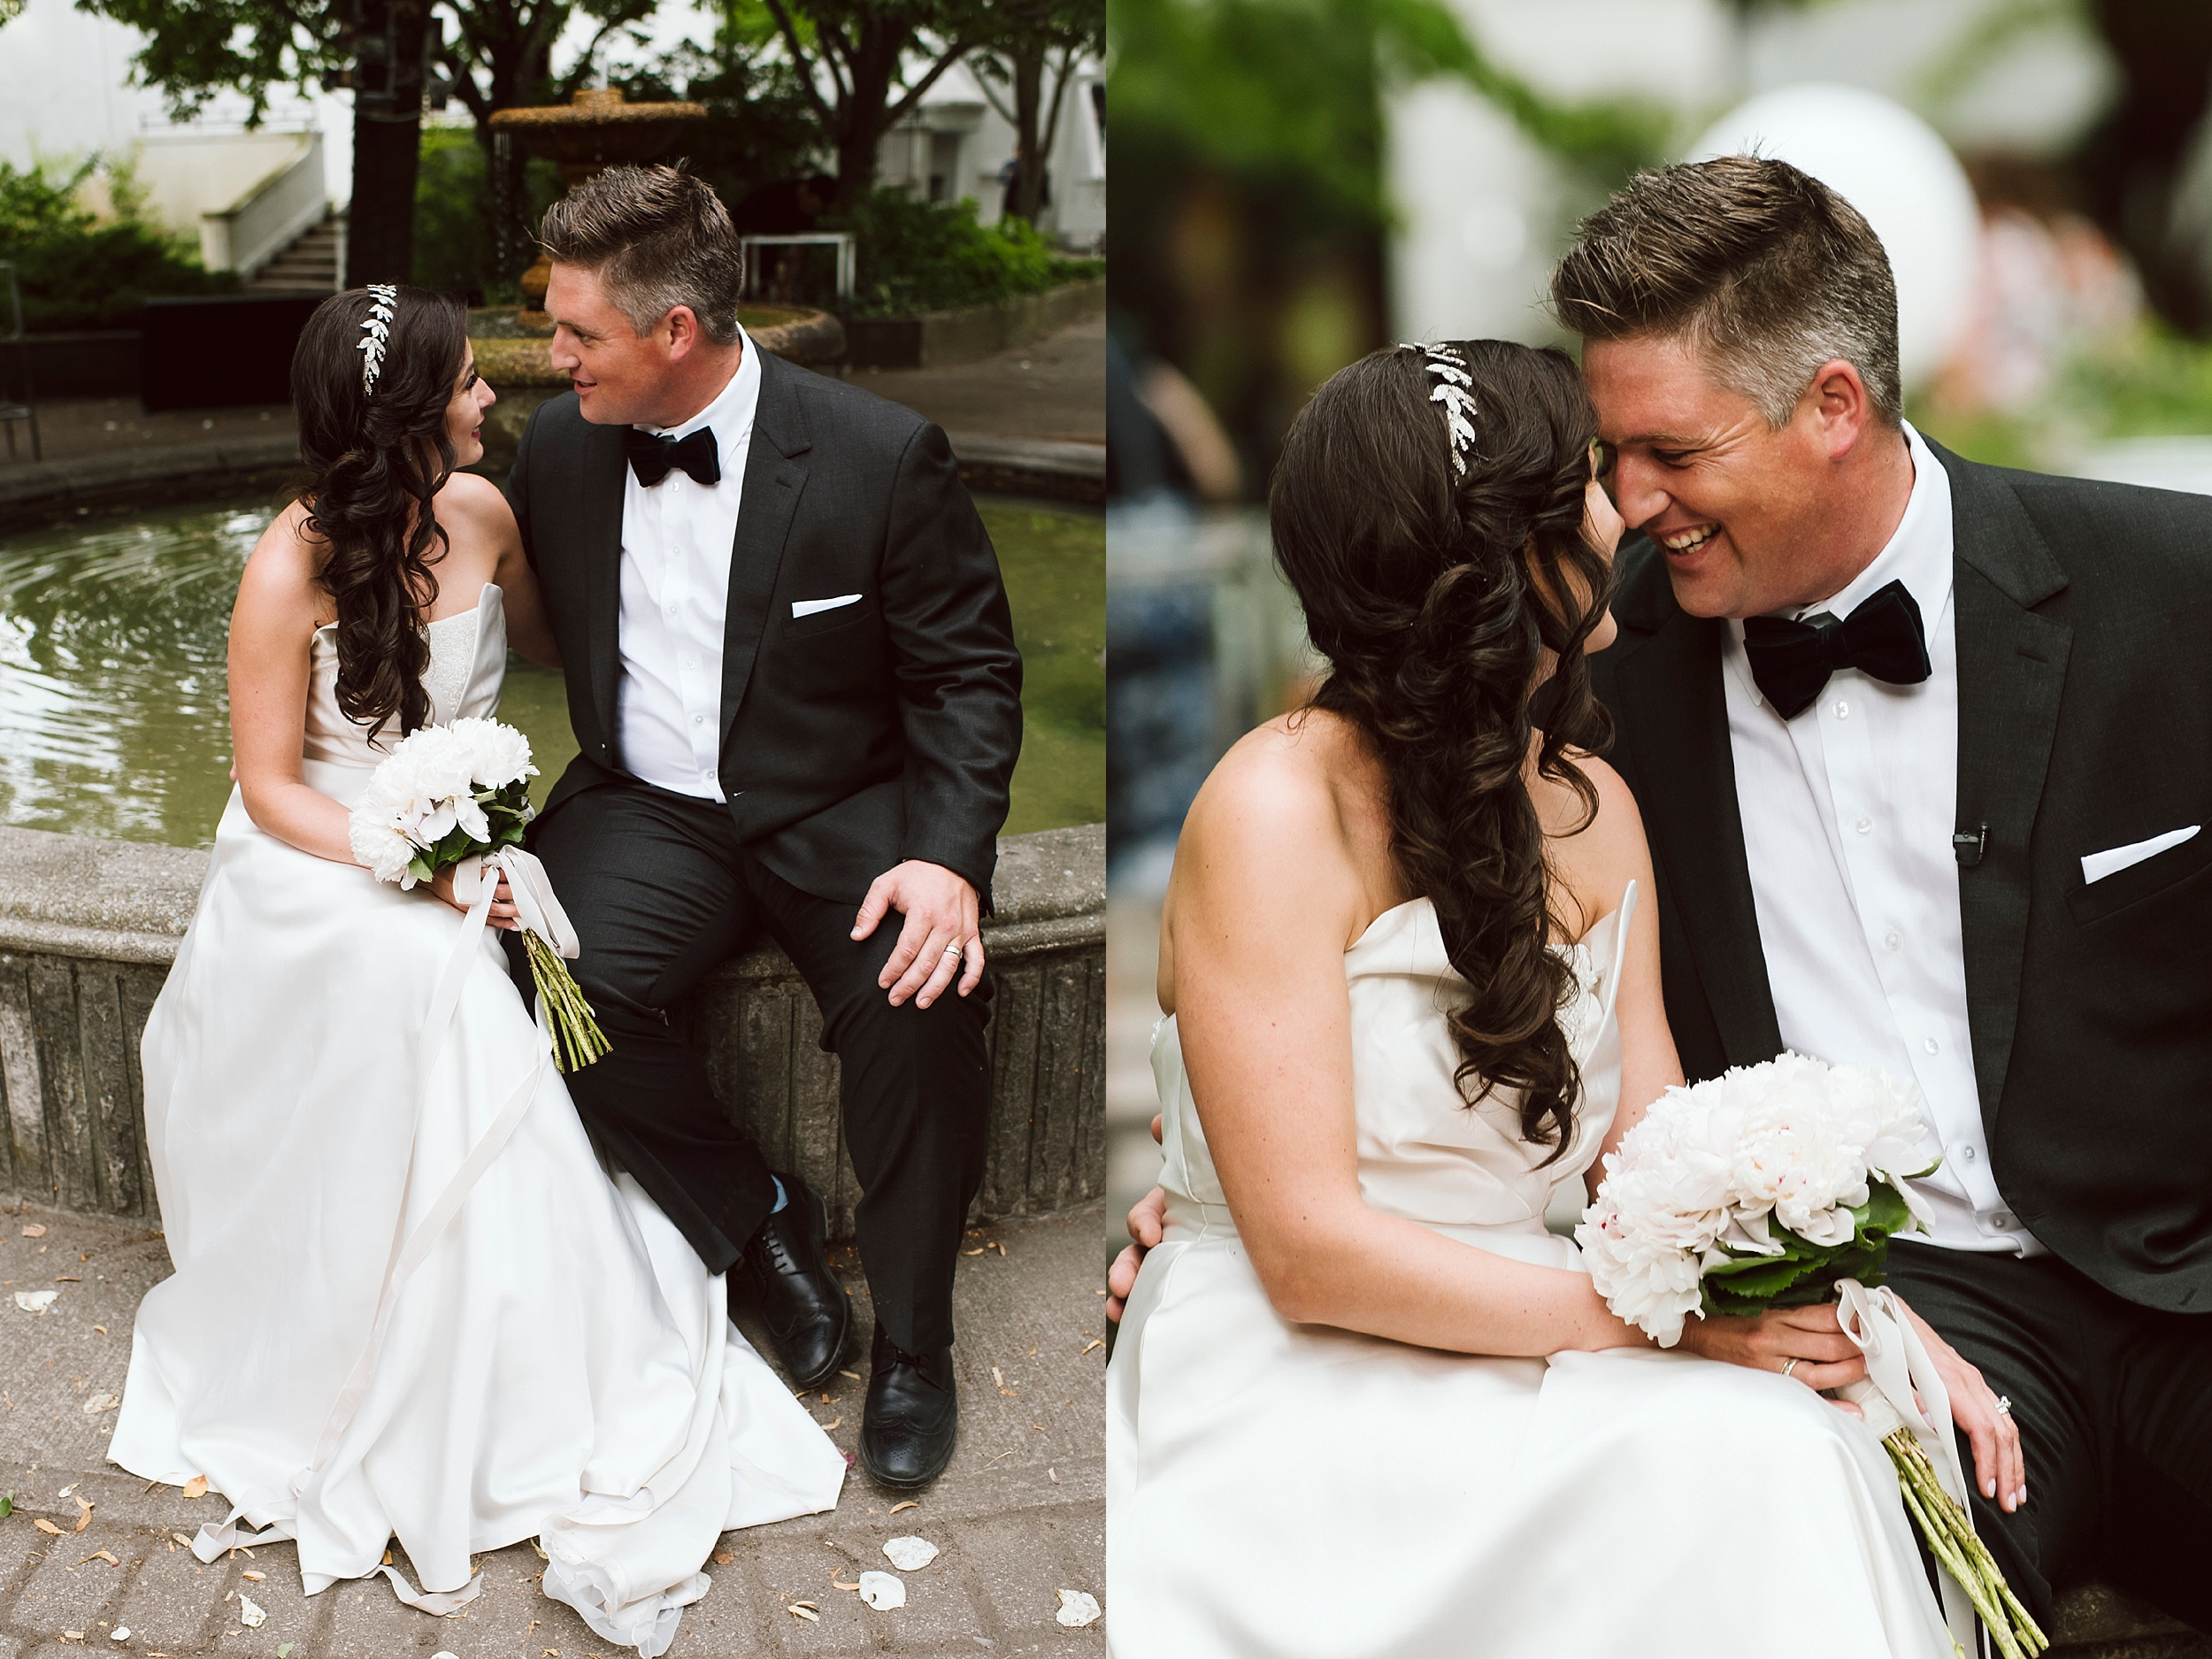 Sunnyside_Pavilion_Wedding_Toronto_Photographer_0064.jpg